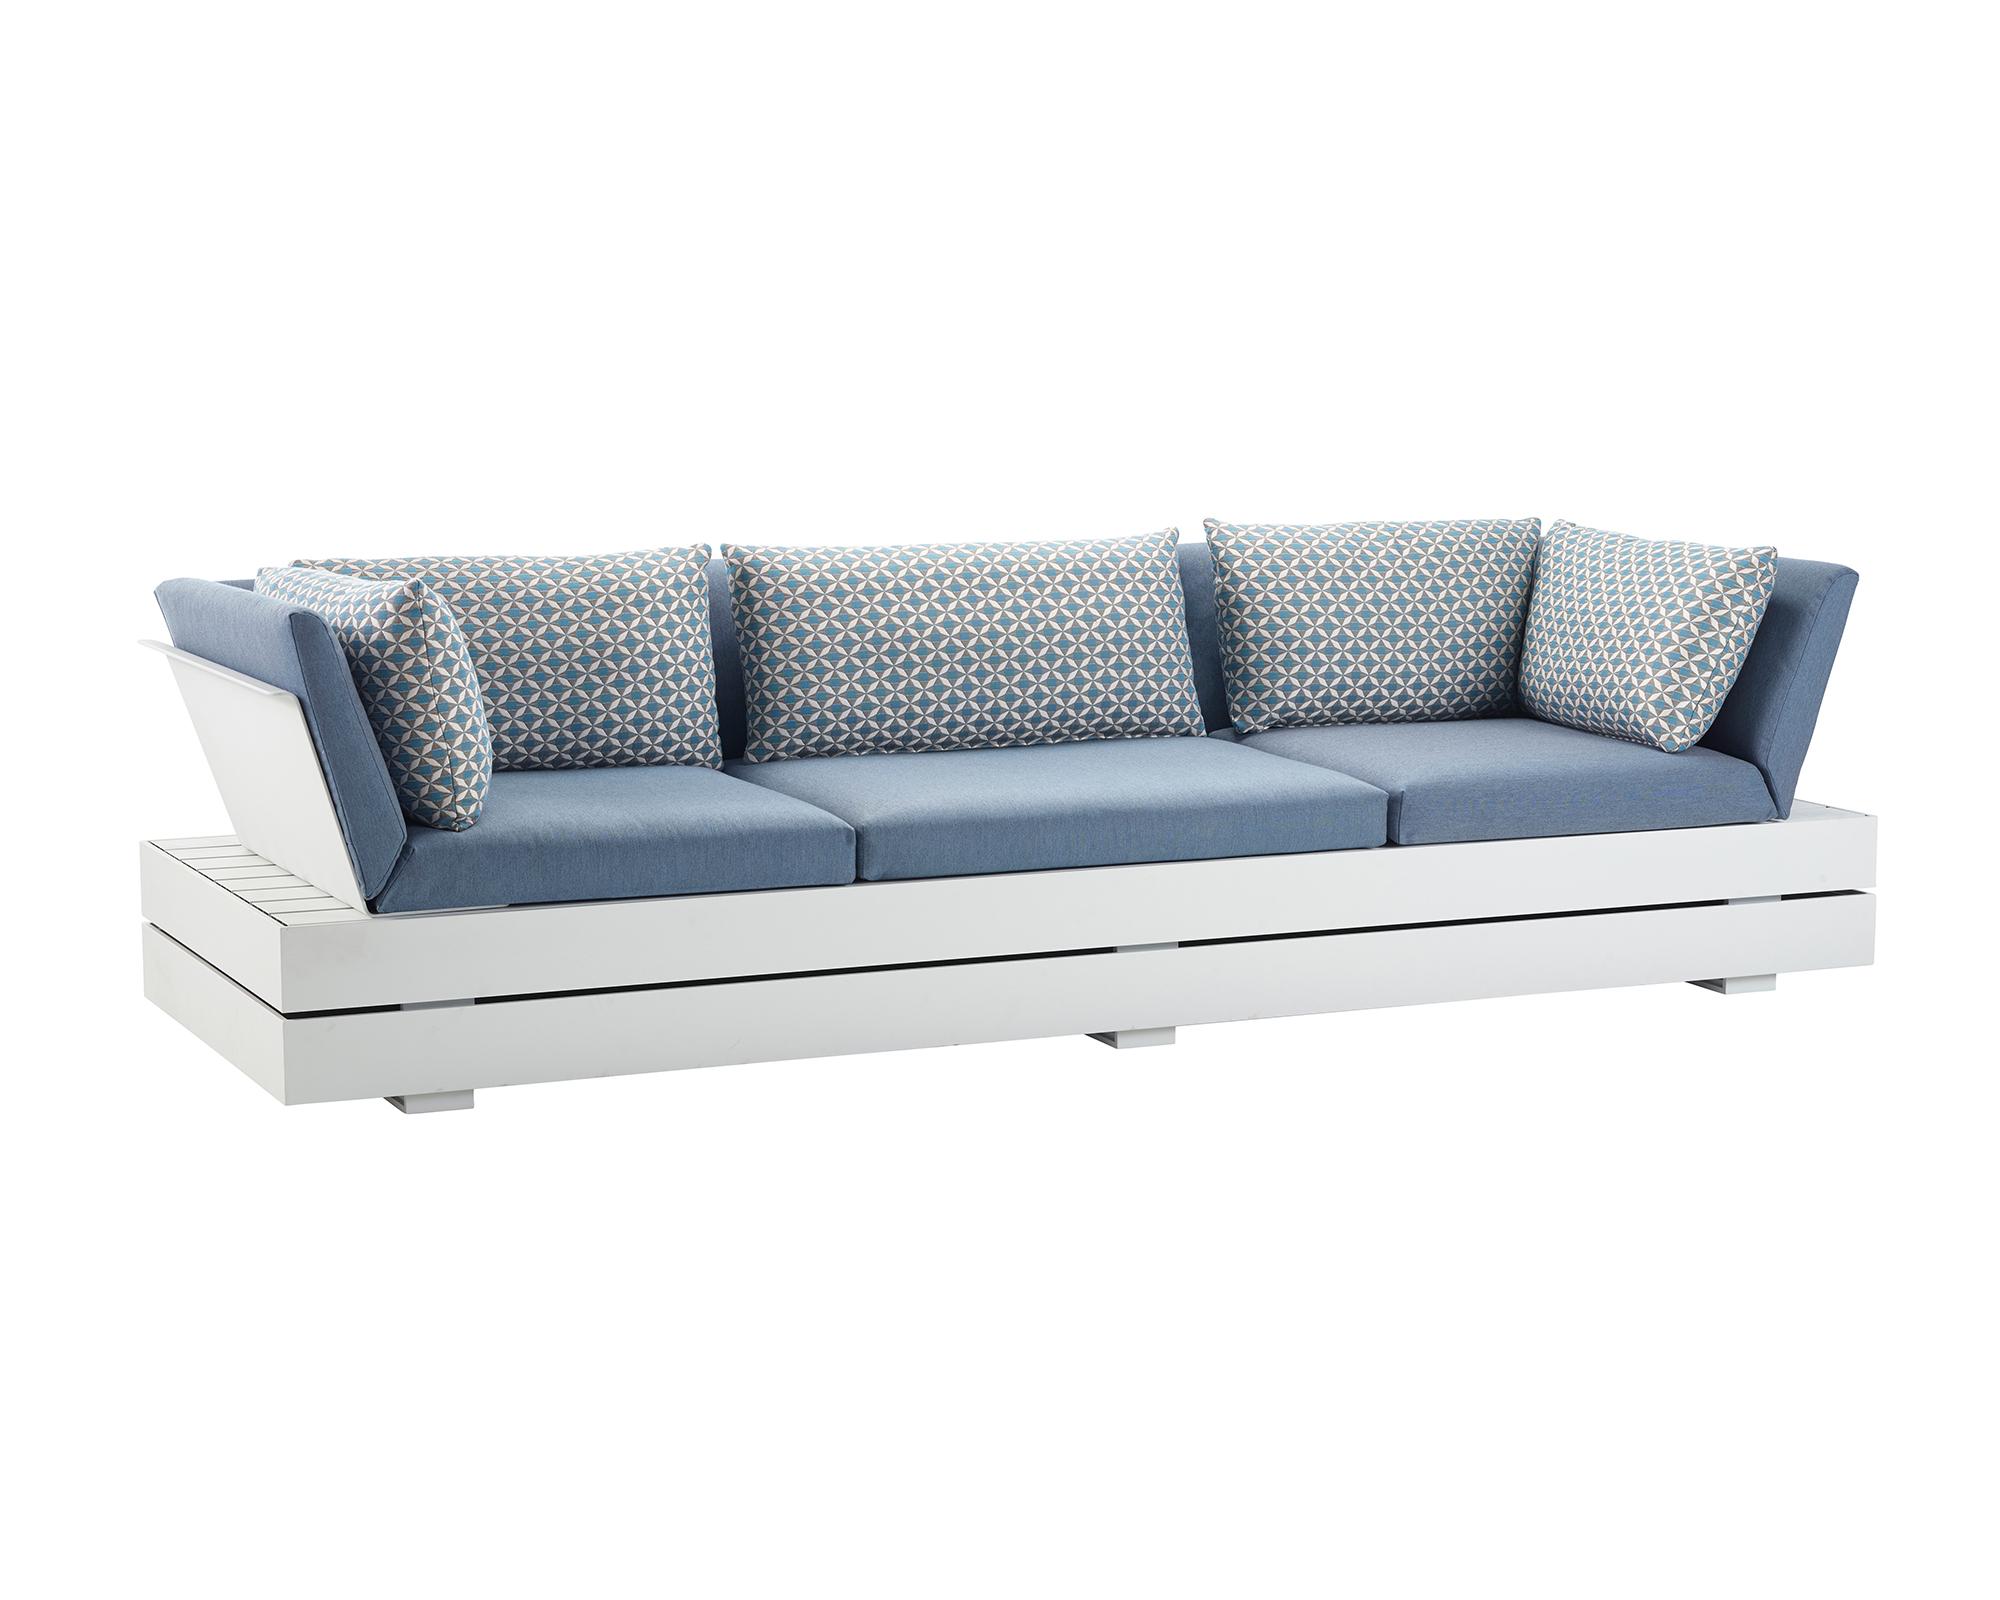 garten lounge boxx 3er sofa eckteil online ausstellung. Black Bedroom Furniture Sets. Home Design Ideas